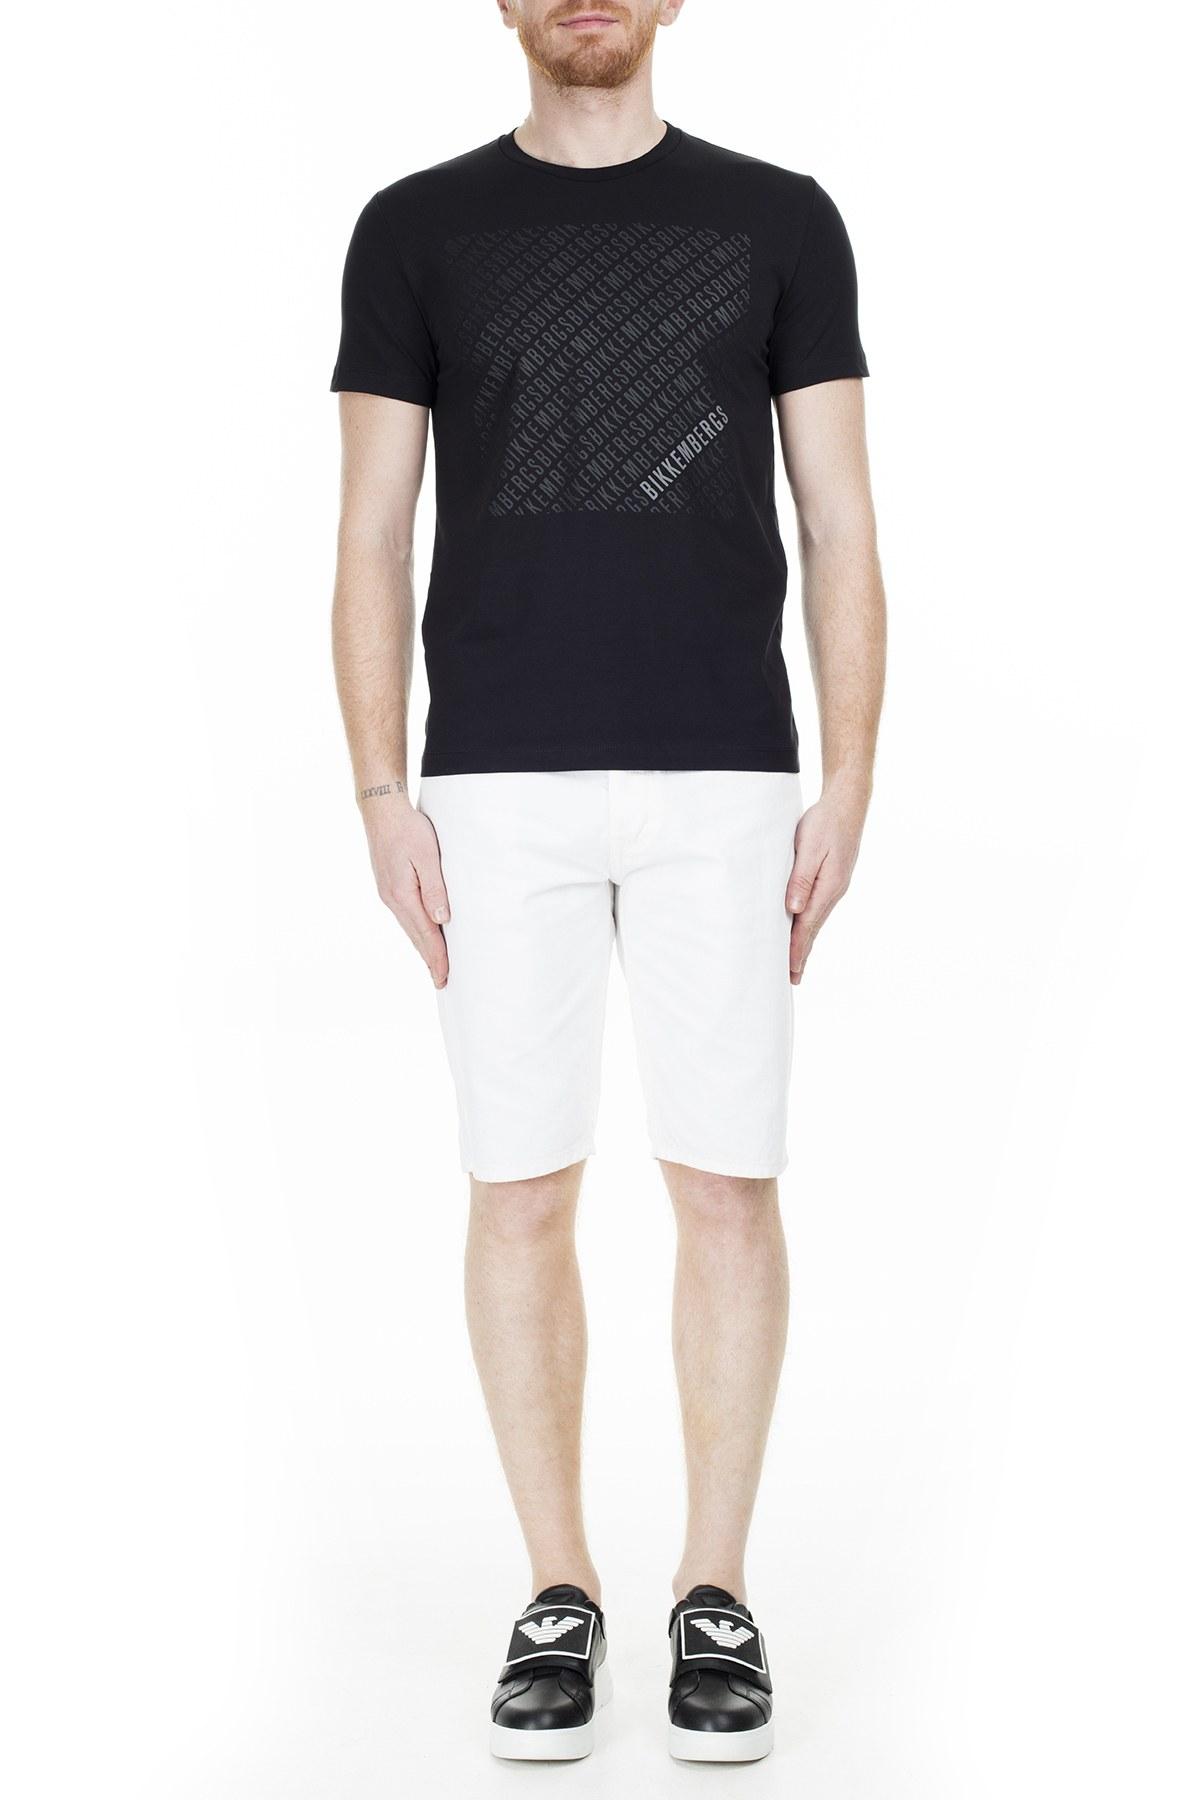 Bikkembergs Erkek T Shirt C70017ZE1951C74 SİYAH